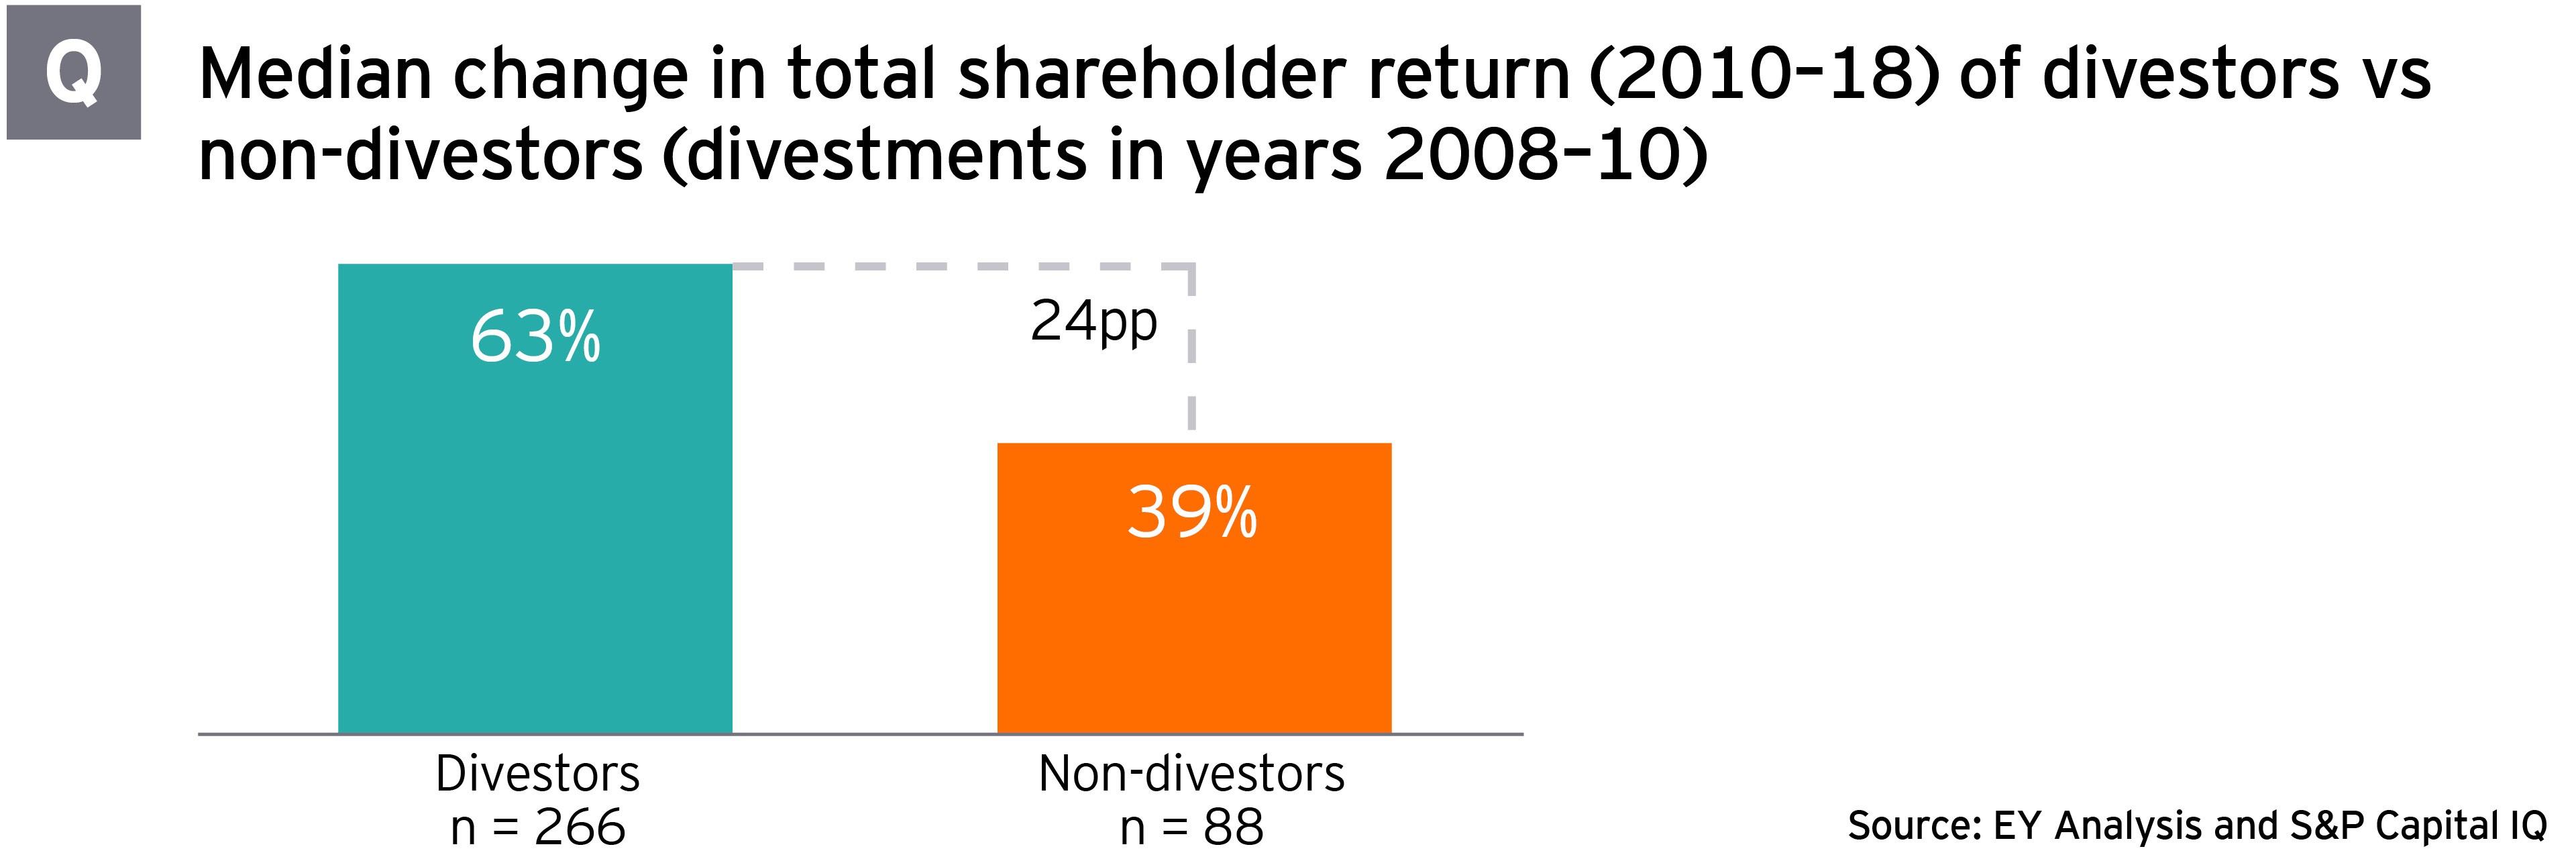 Median change in total shareholder return 2010-18 of divestors vs non-divestors 2008-10